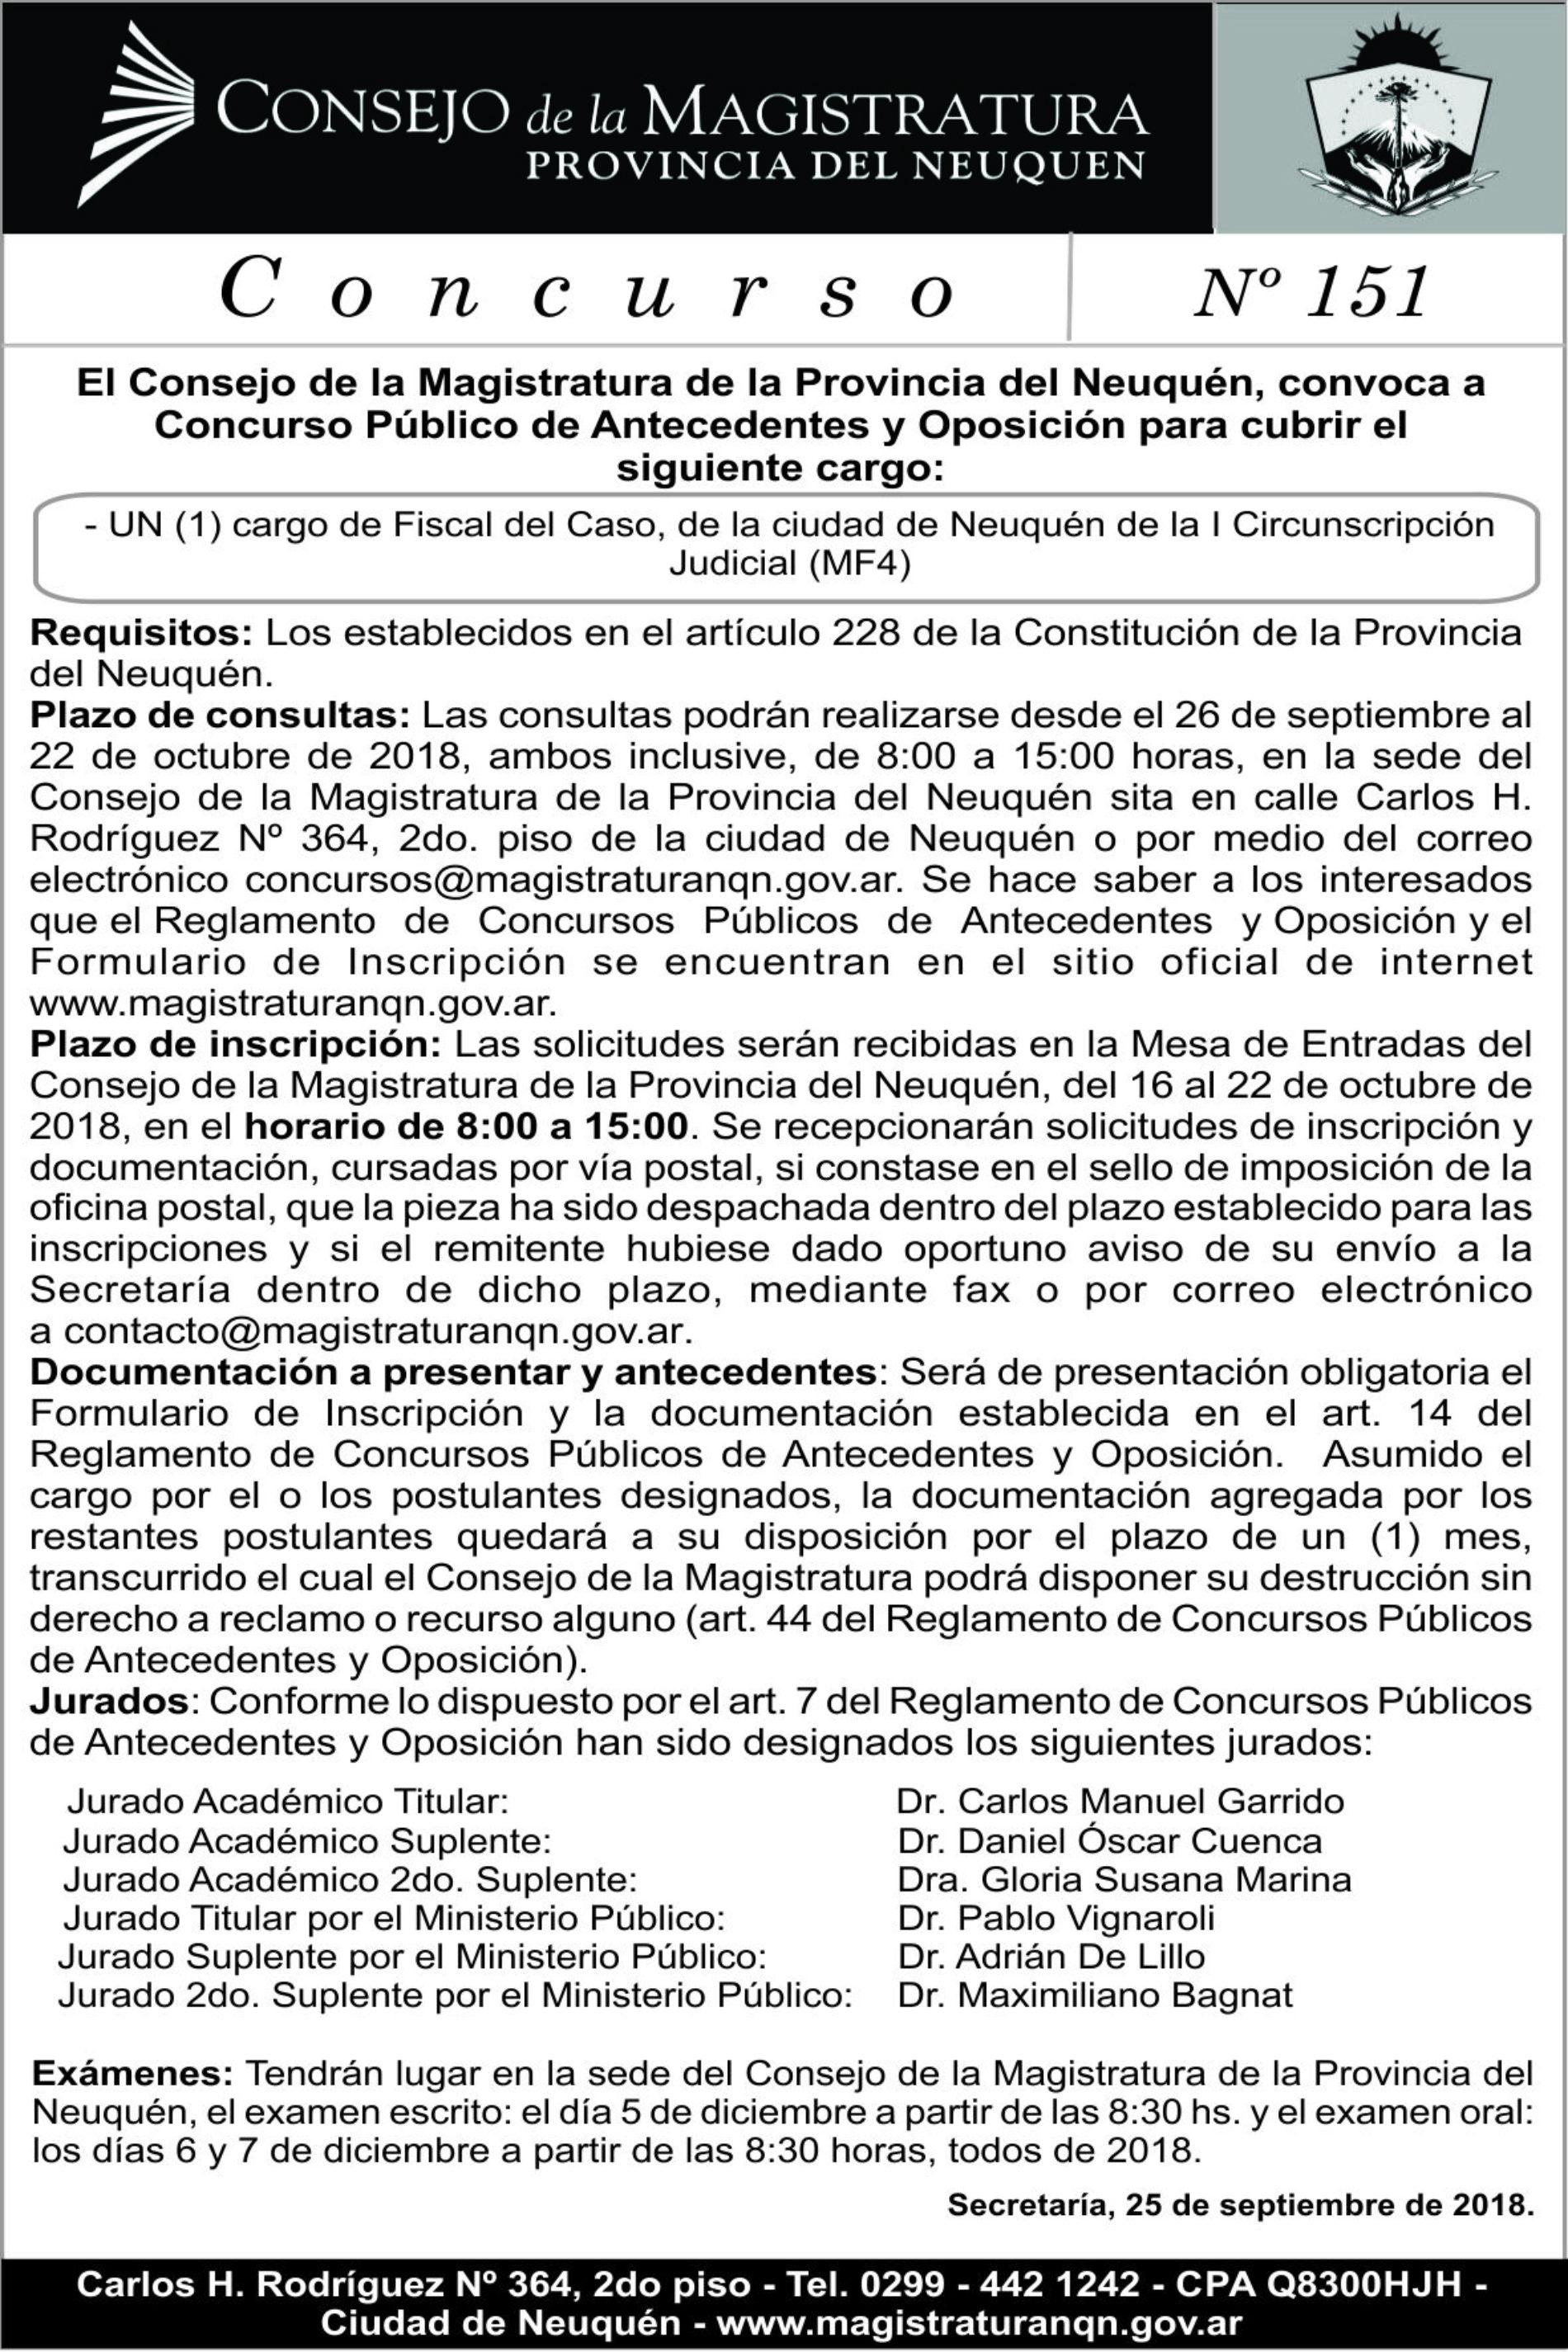 «Consejo de la Magistratura – Provincia de Neuquén». Concurso N° 151.